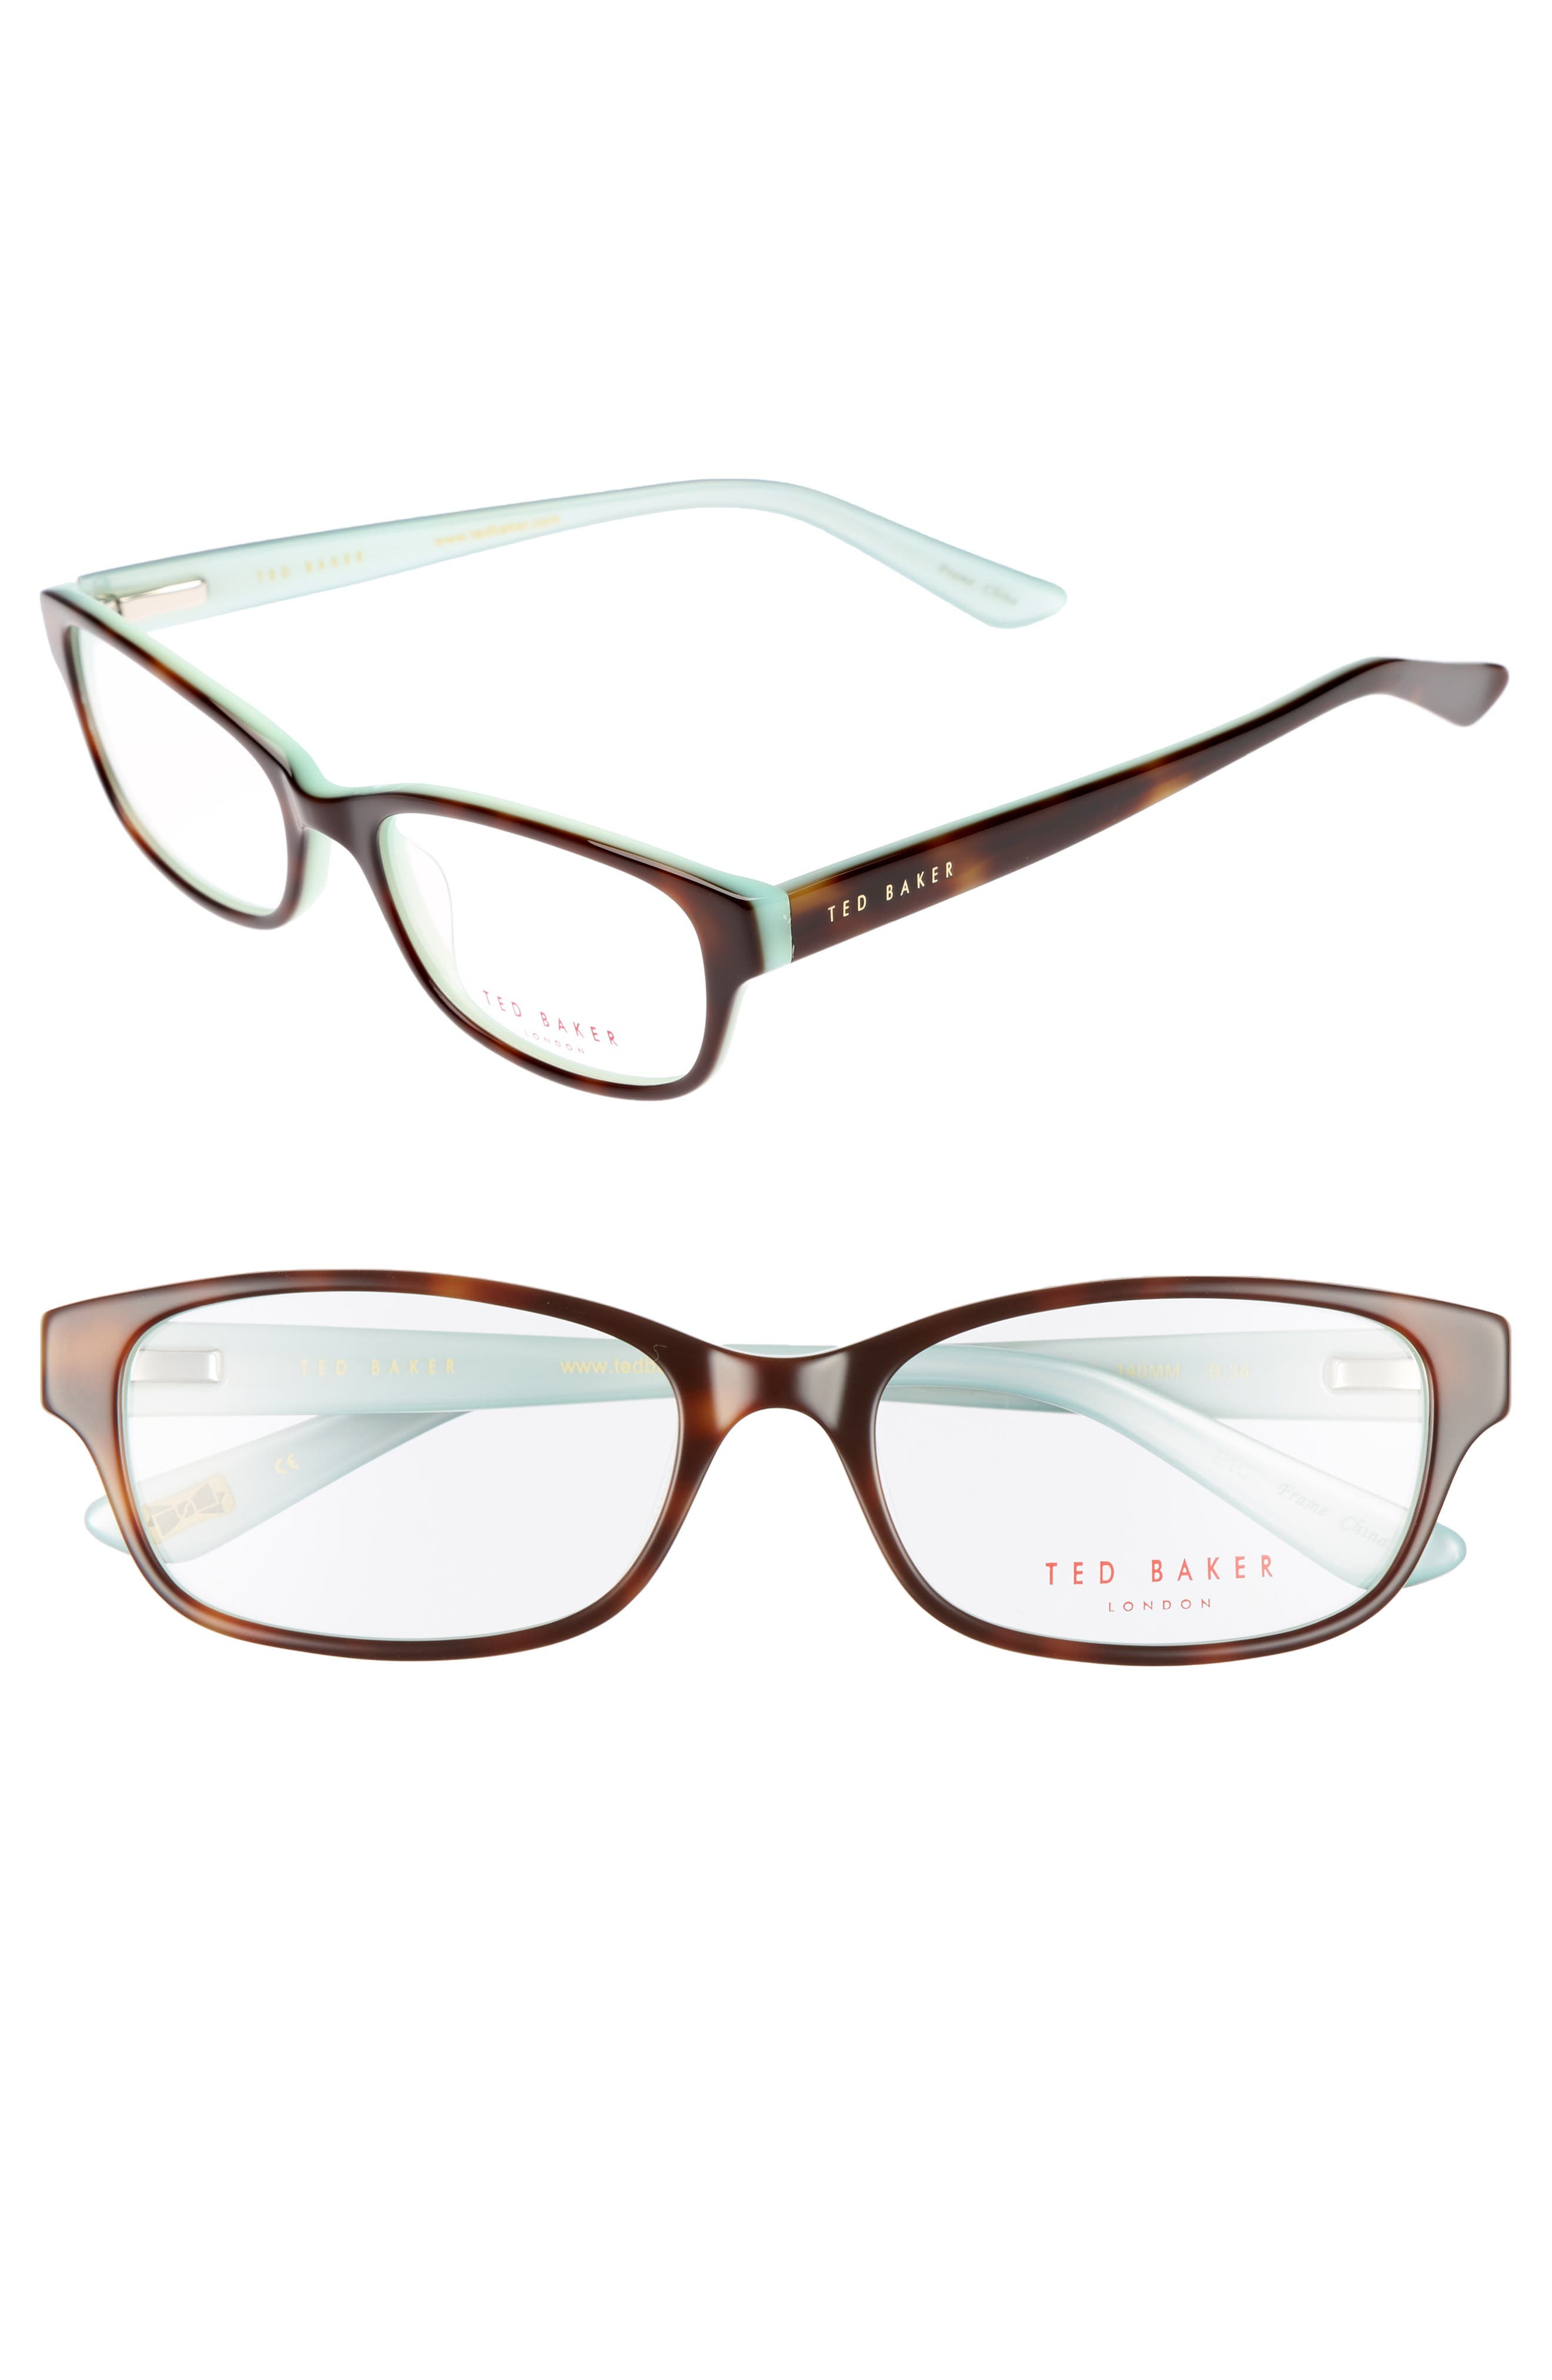 53mm Optical Glasses,                             Main thumbnail 1, color,                             200